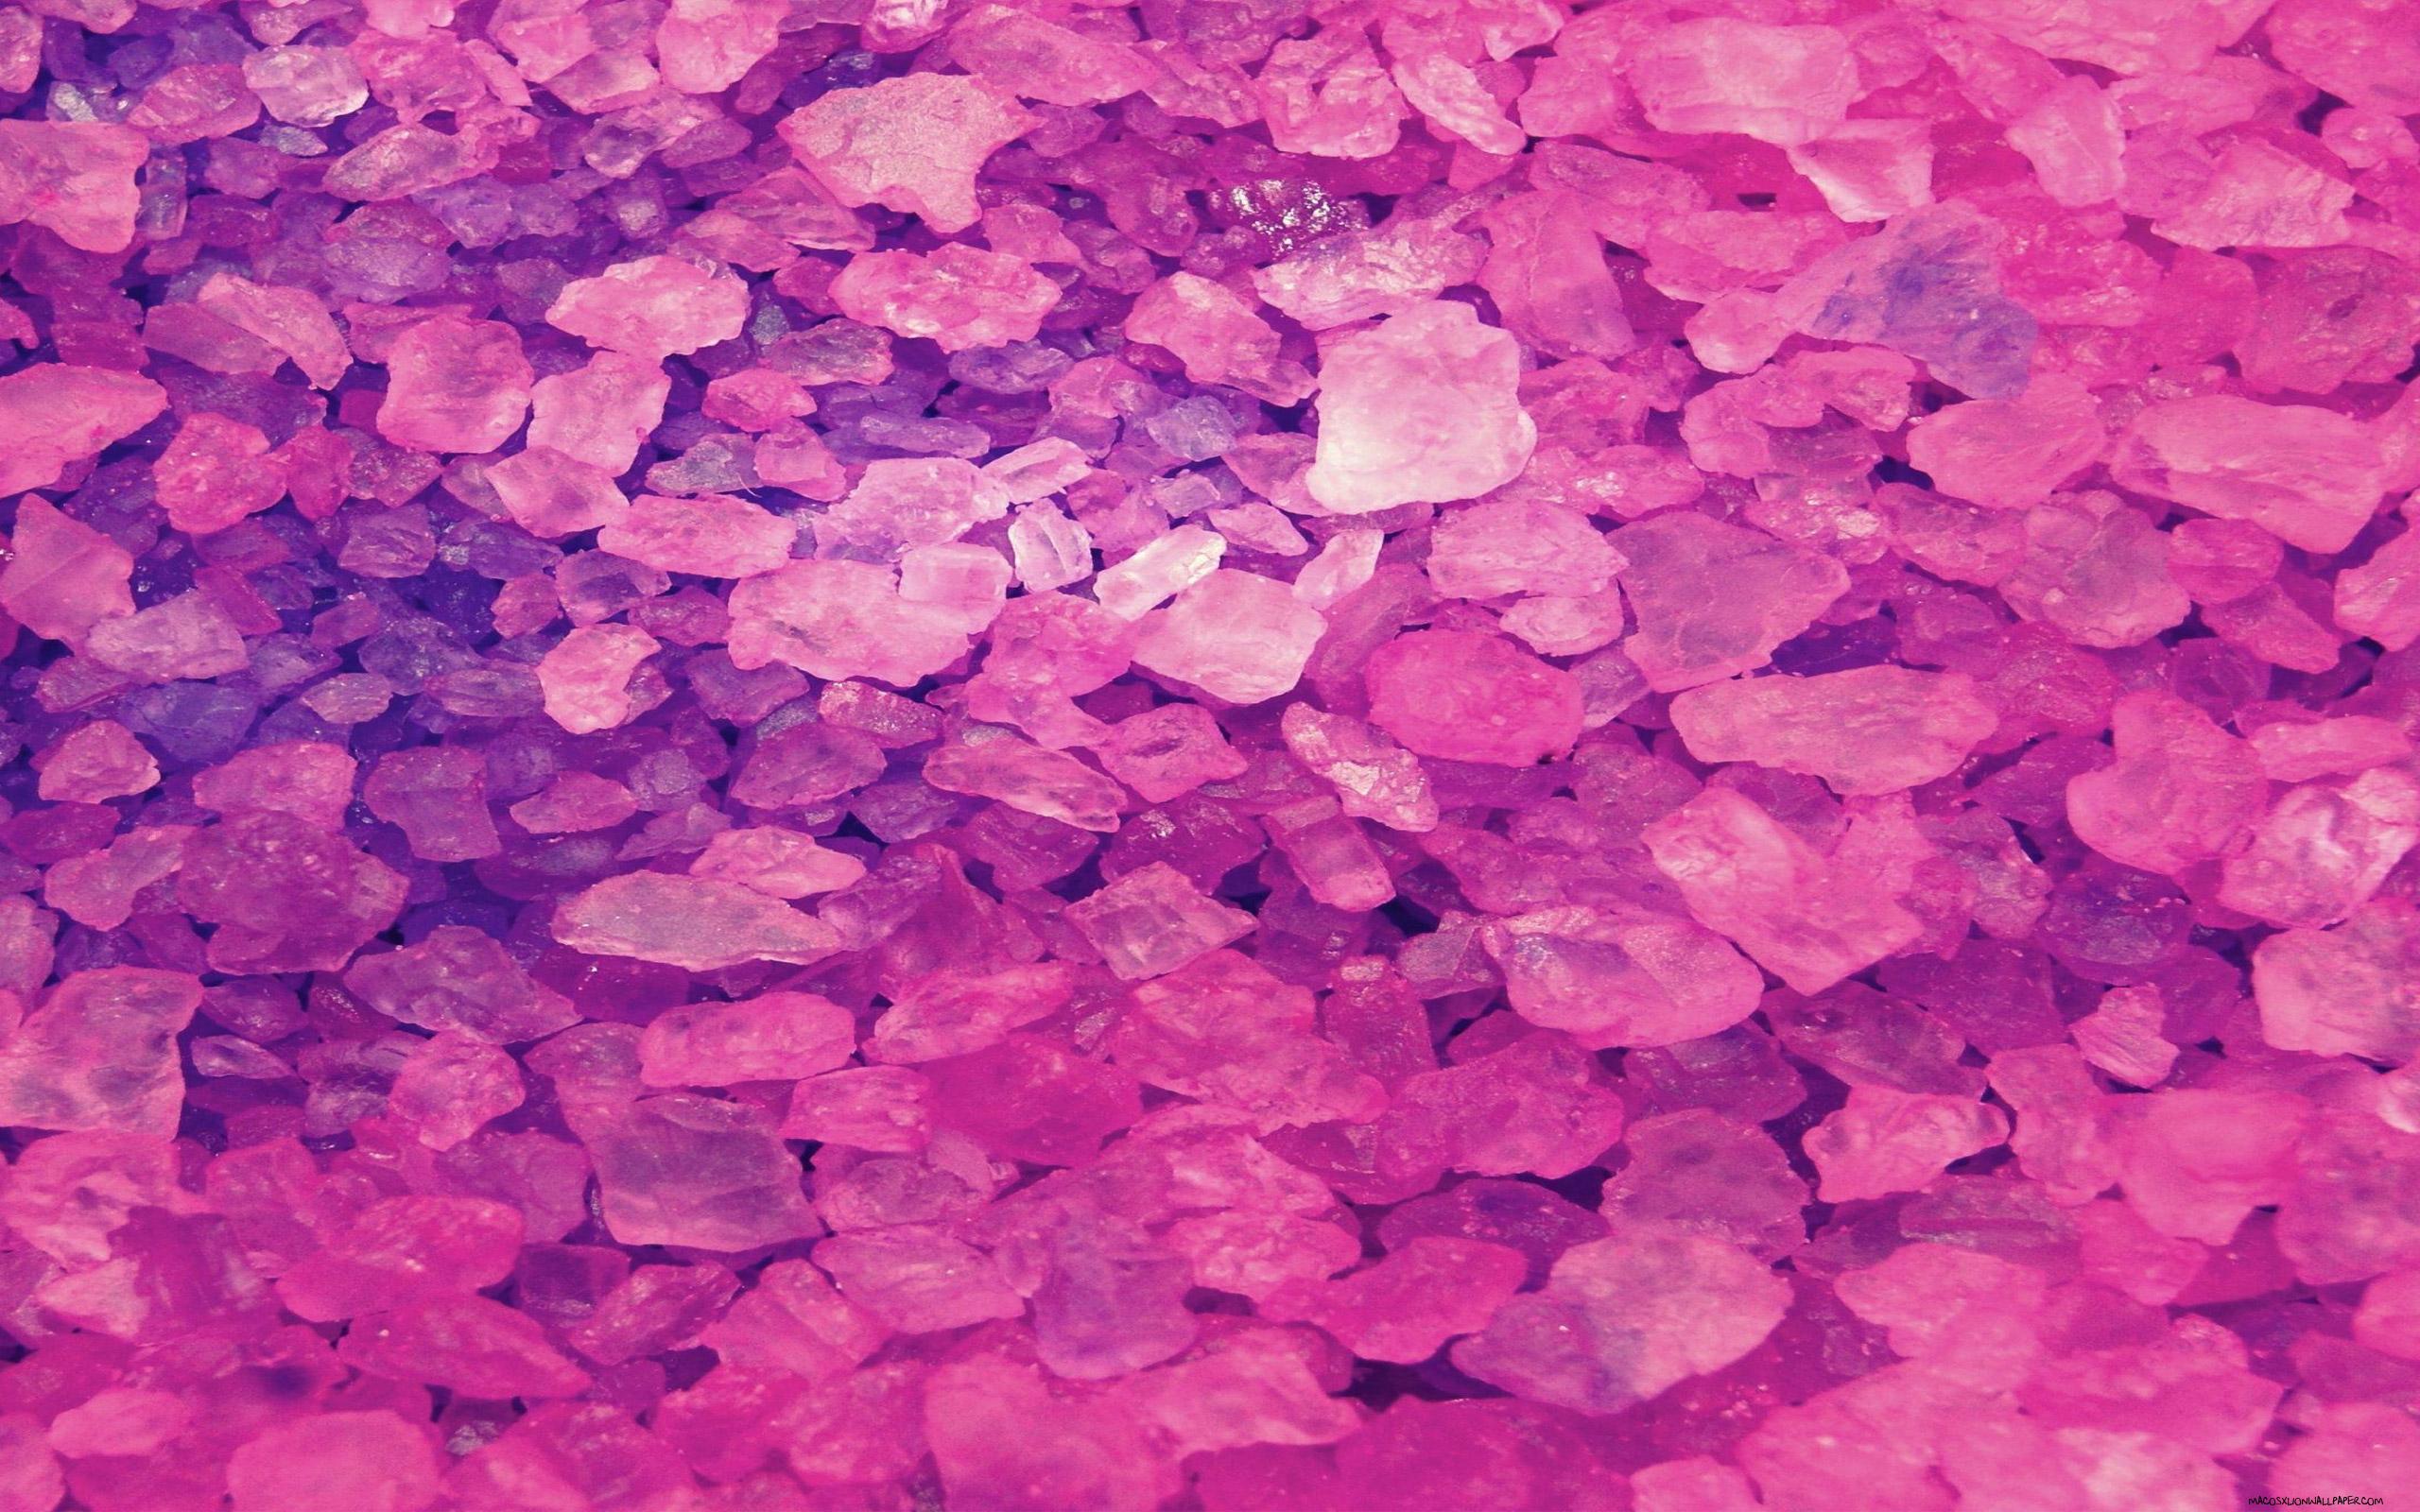 Pink Stones wallpaper Background 2560x1600 Mac OS X Lion Wallpaper 2560x1600